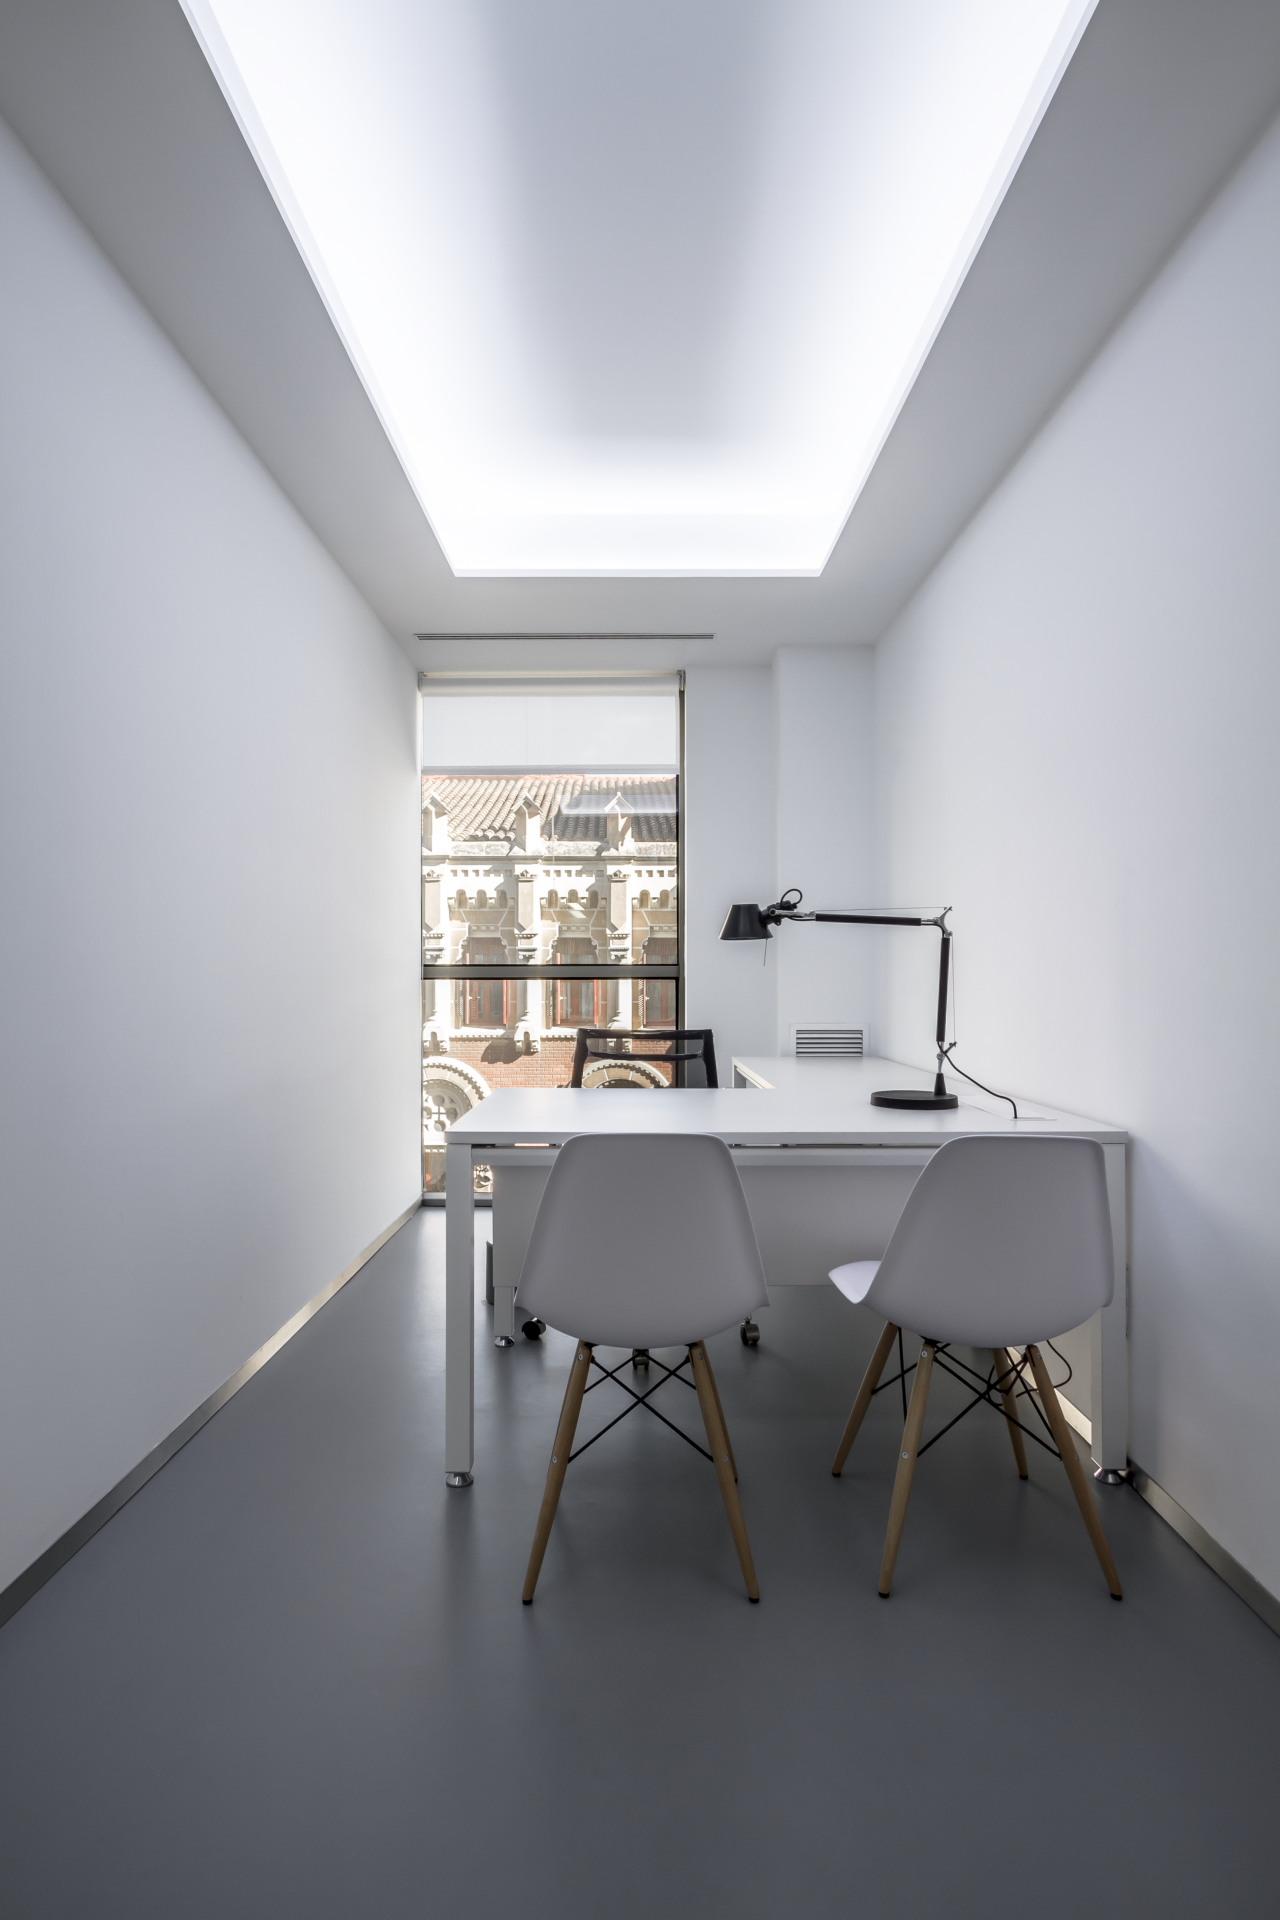 fotografia-arquitectura-valencia-german-cabo-hernandez-clinica (13)